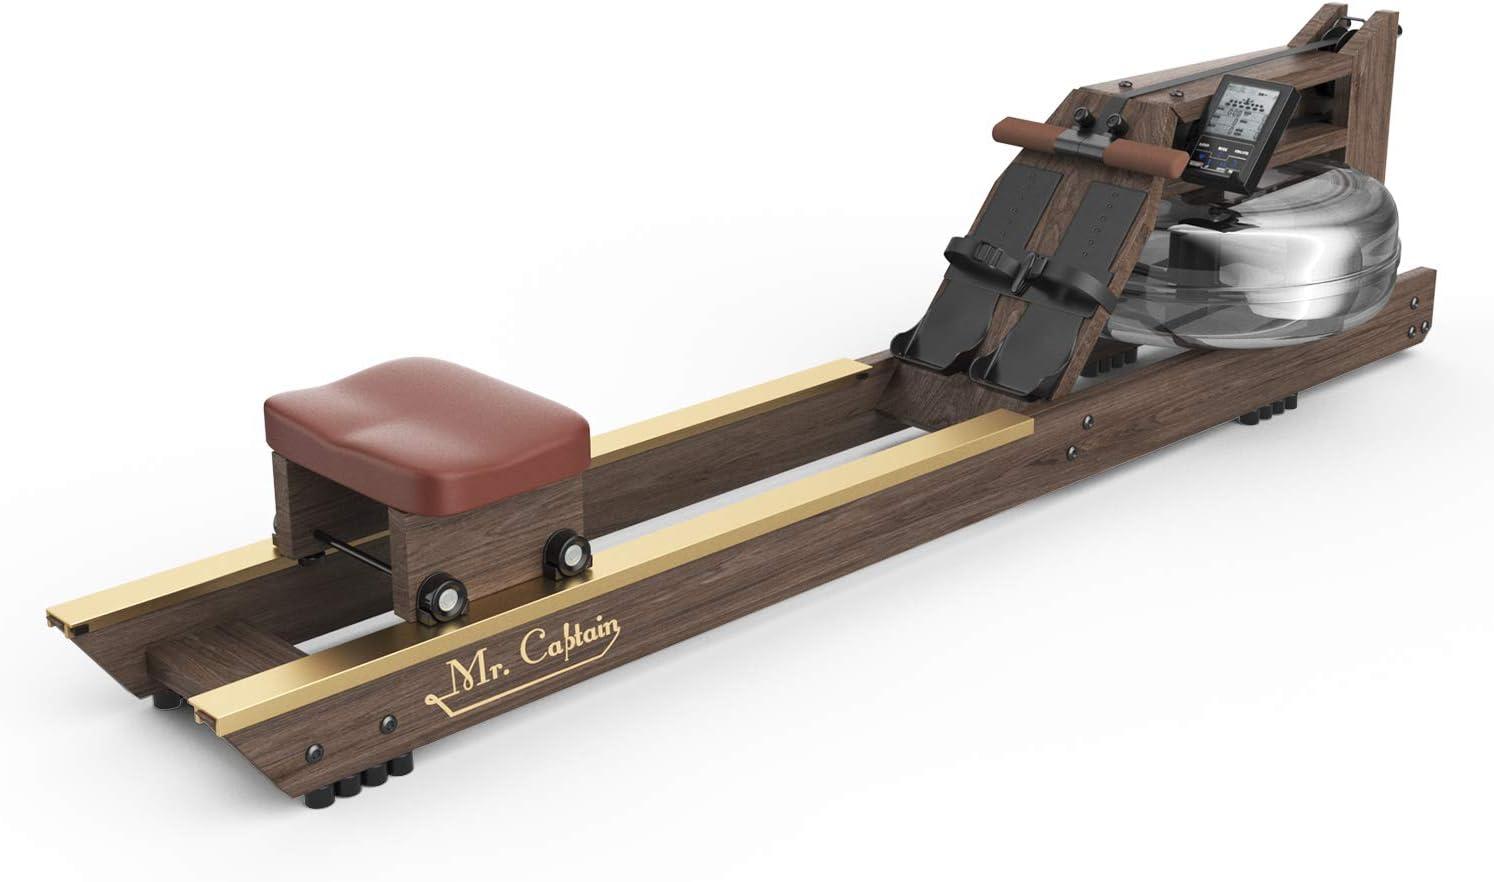 Mr Captain Rowing Machine